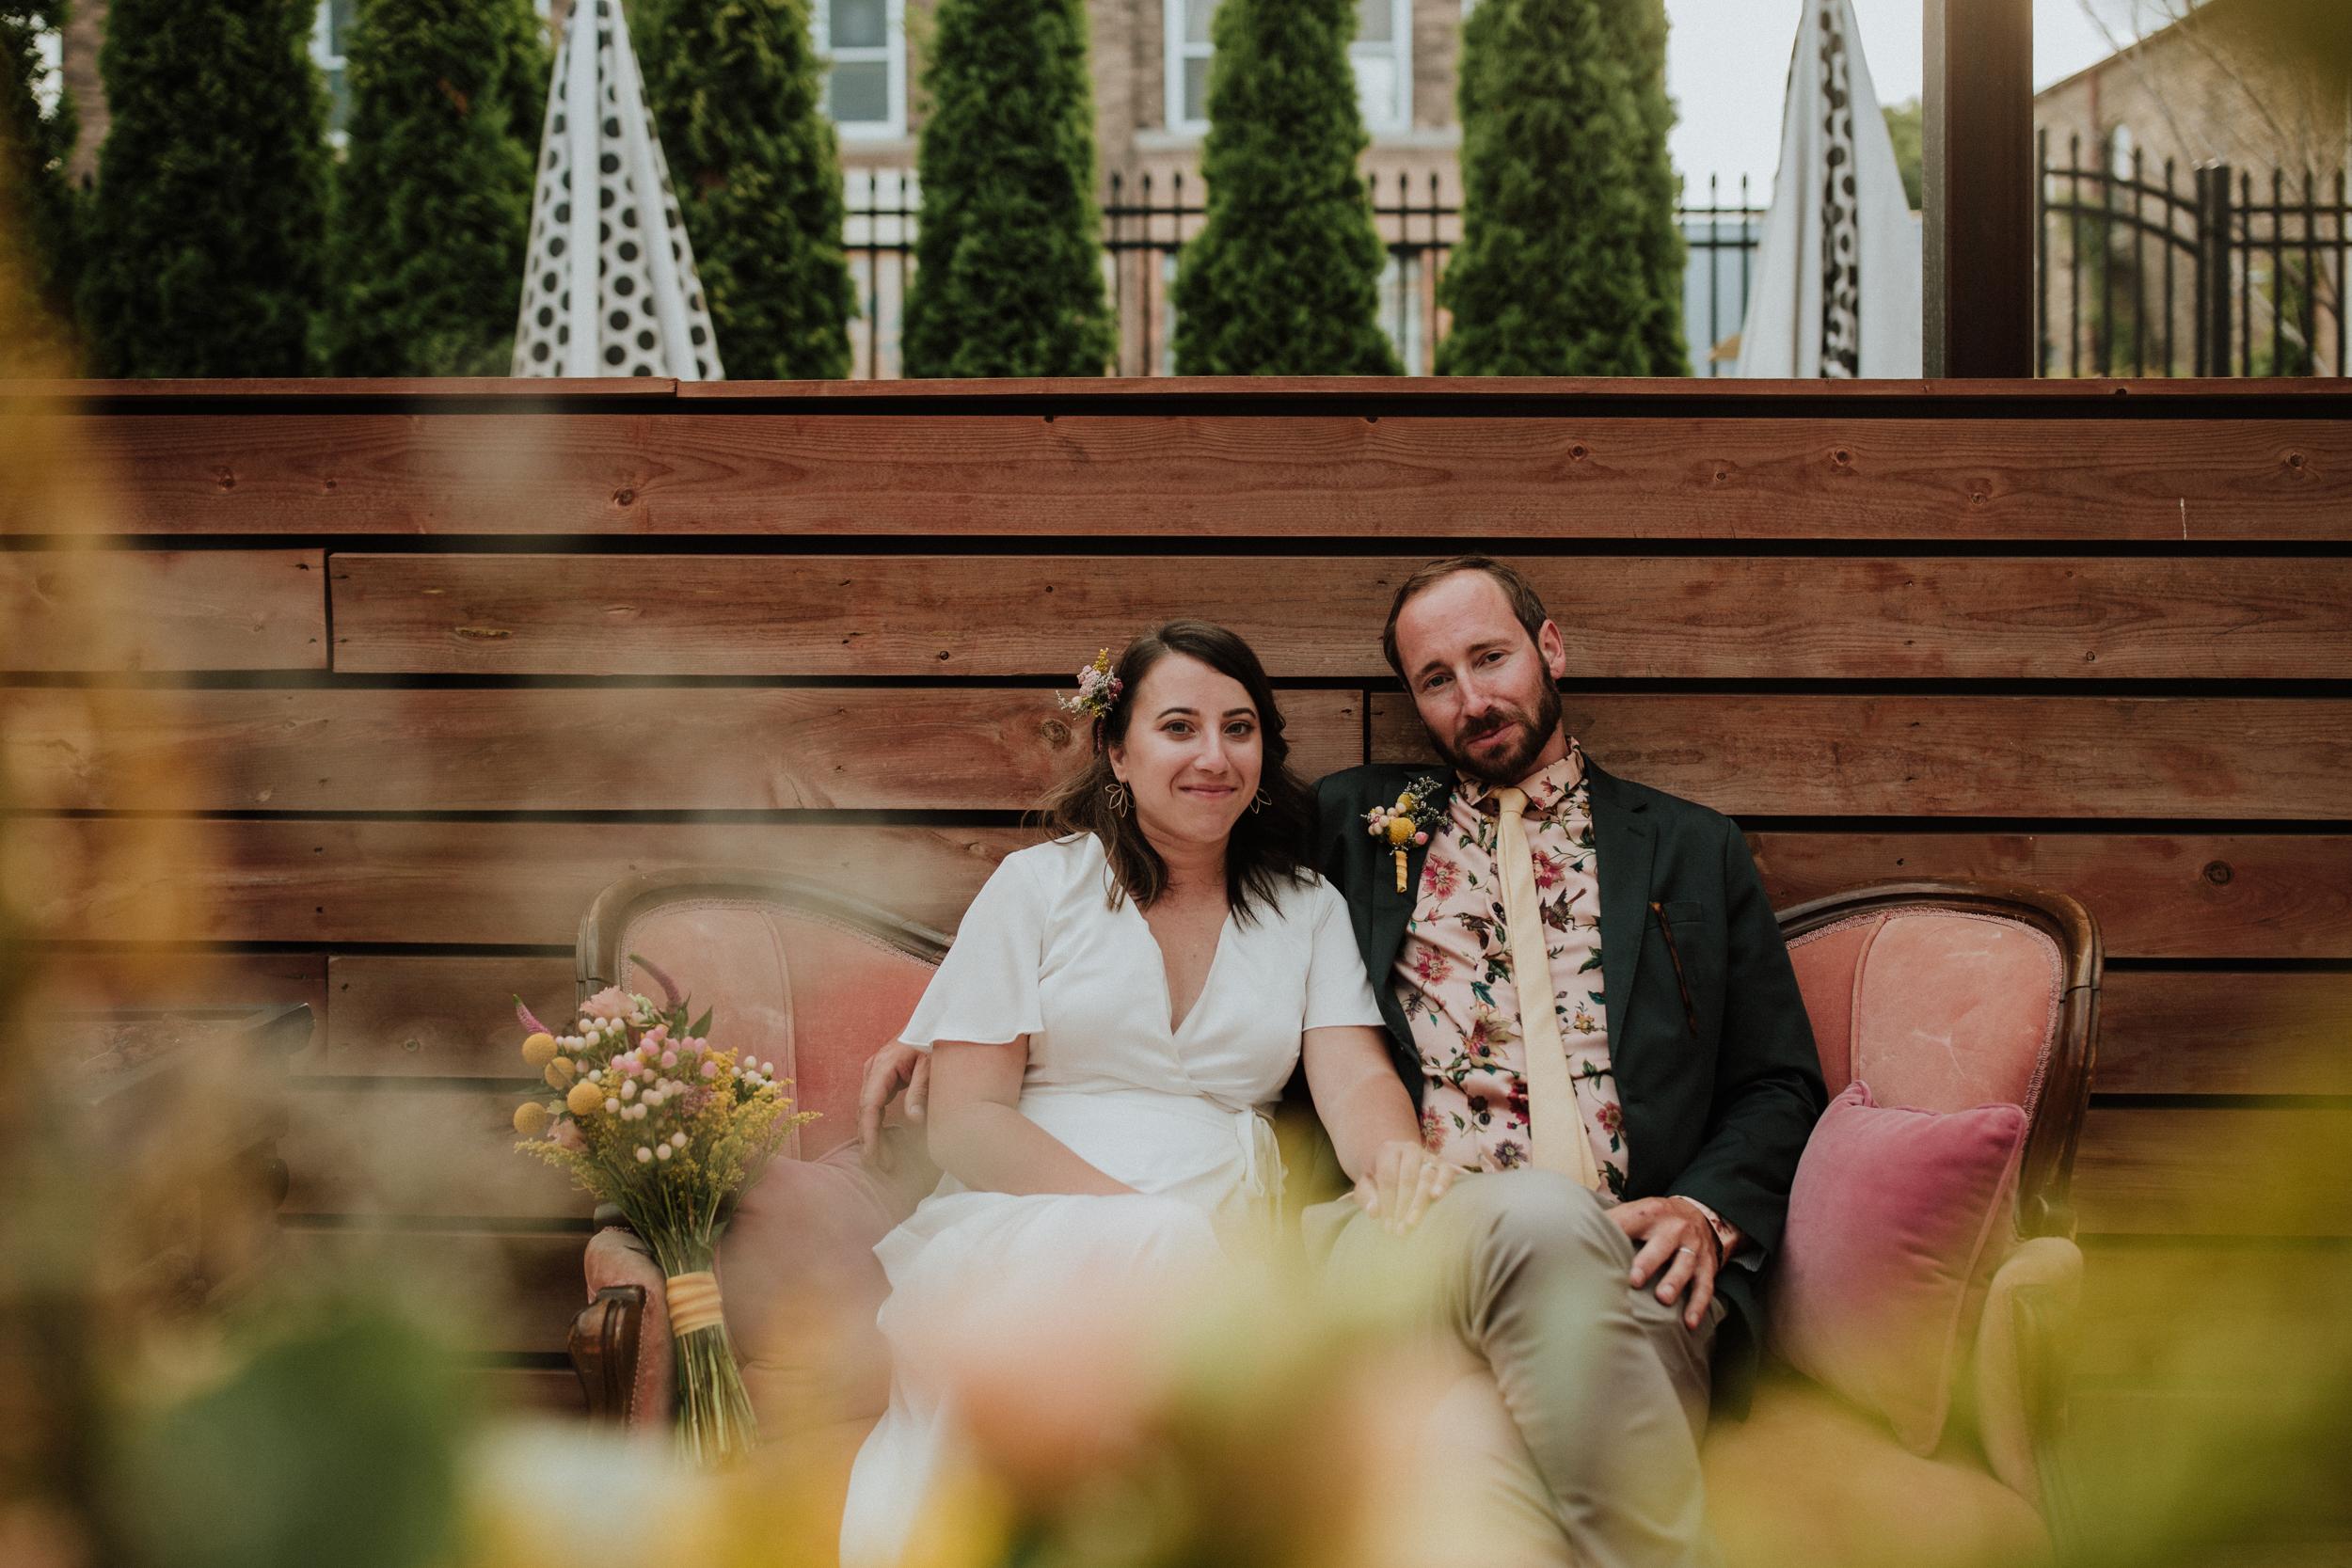 Caitlyn + Jacob - Intimate + Unique Wedding at Hotel Madrid